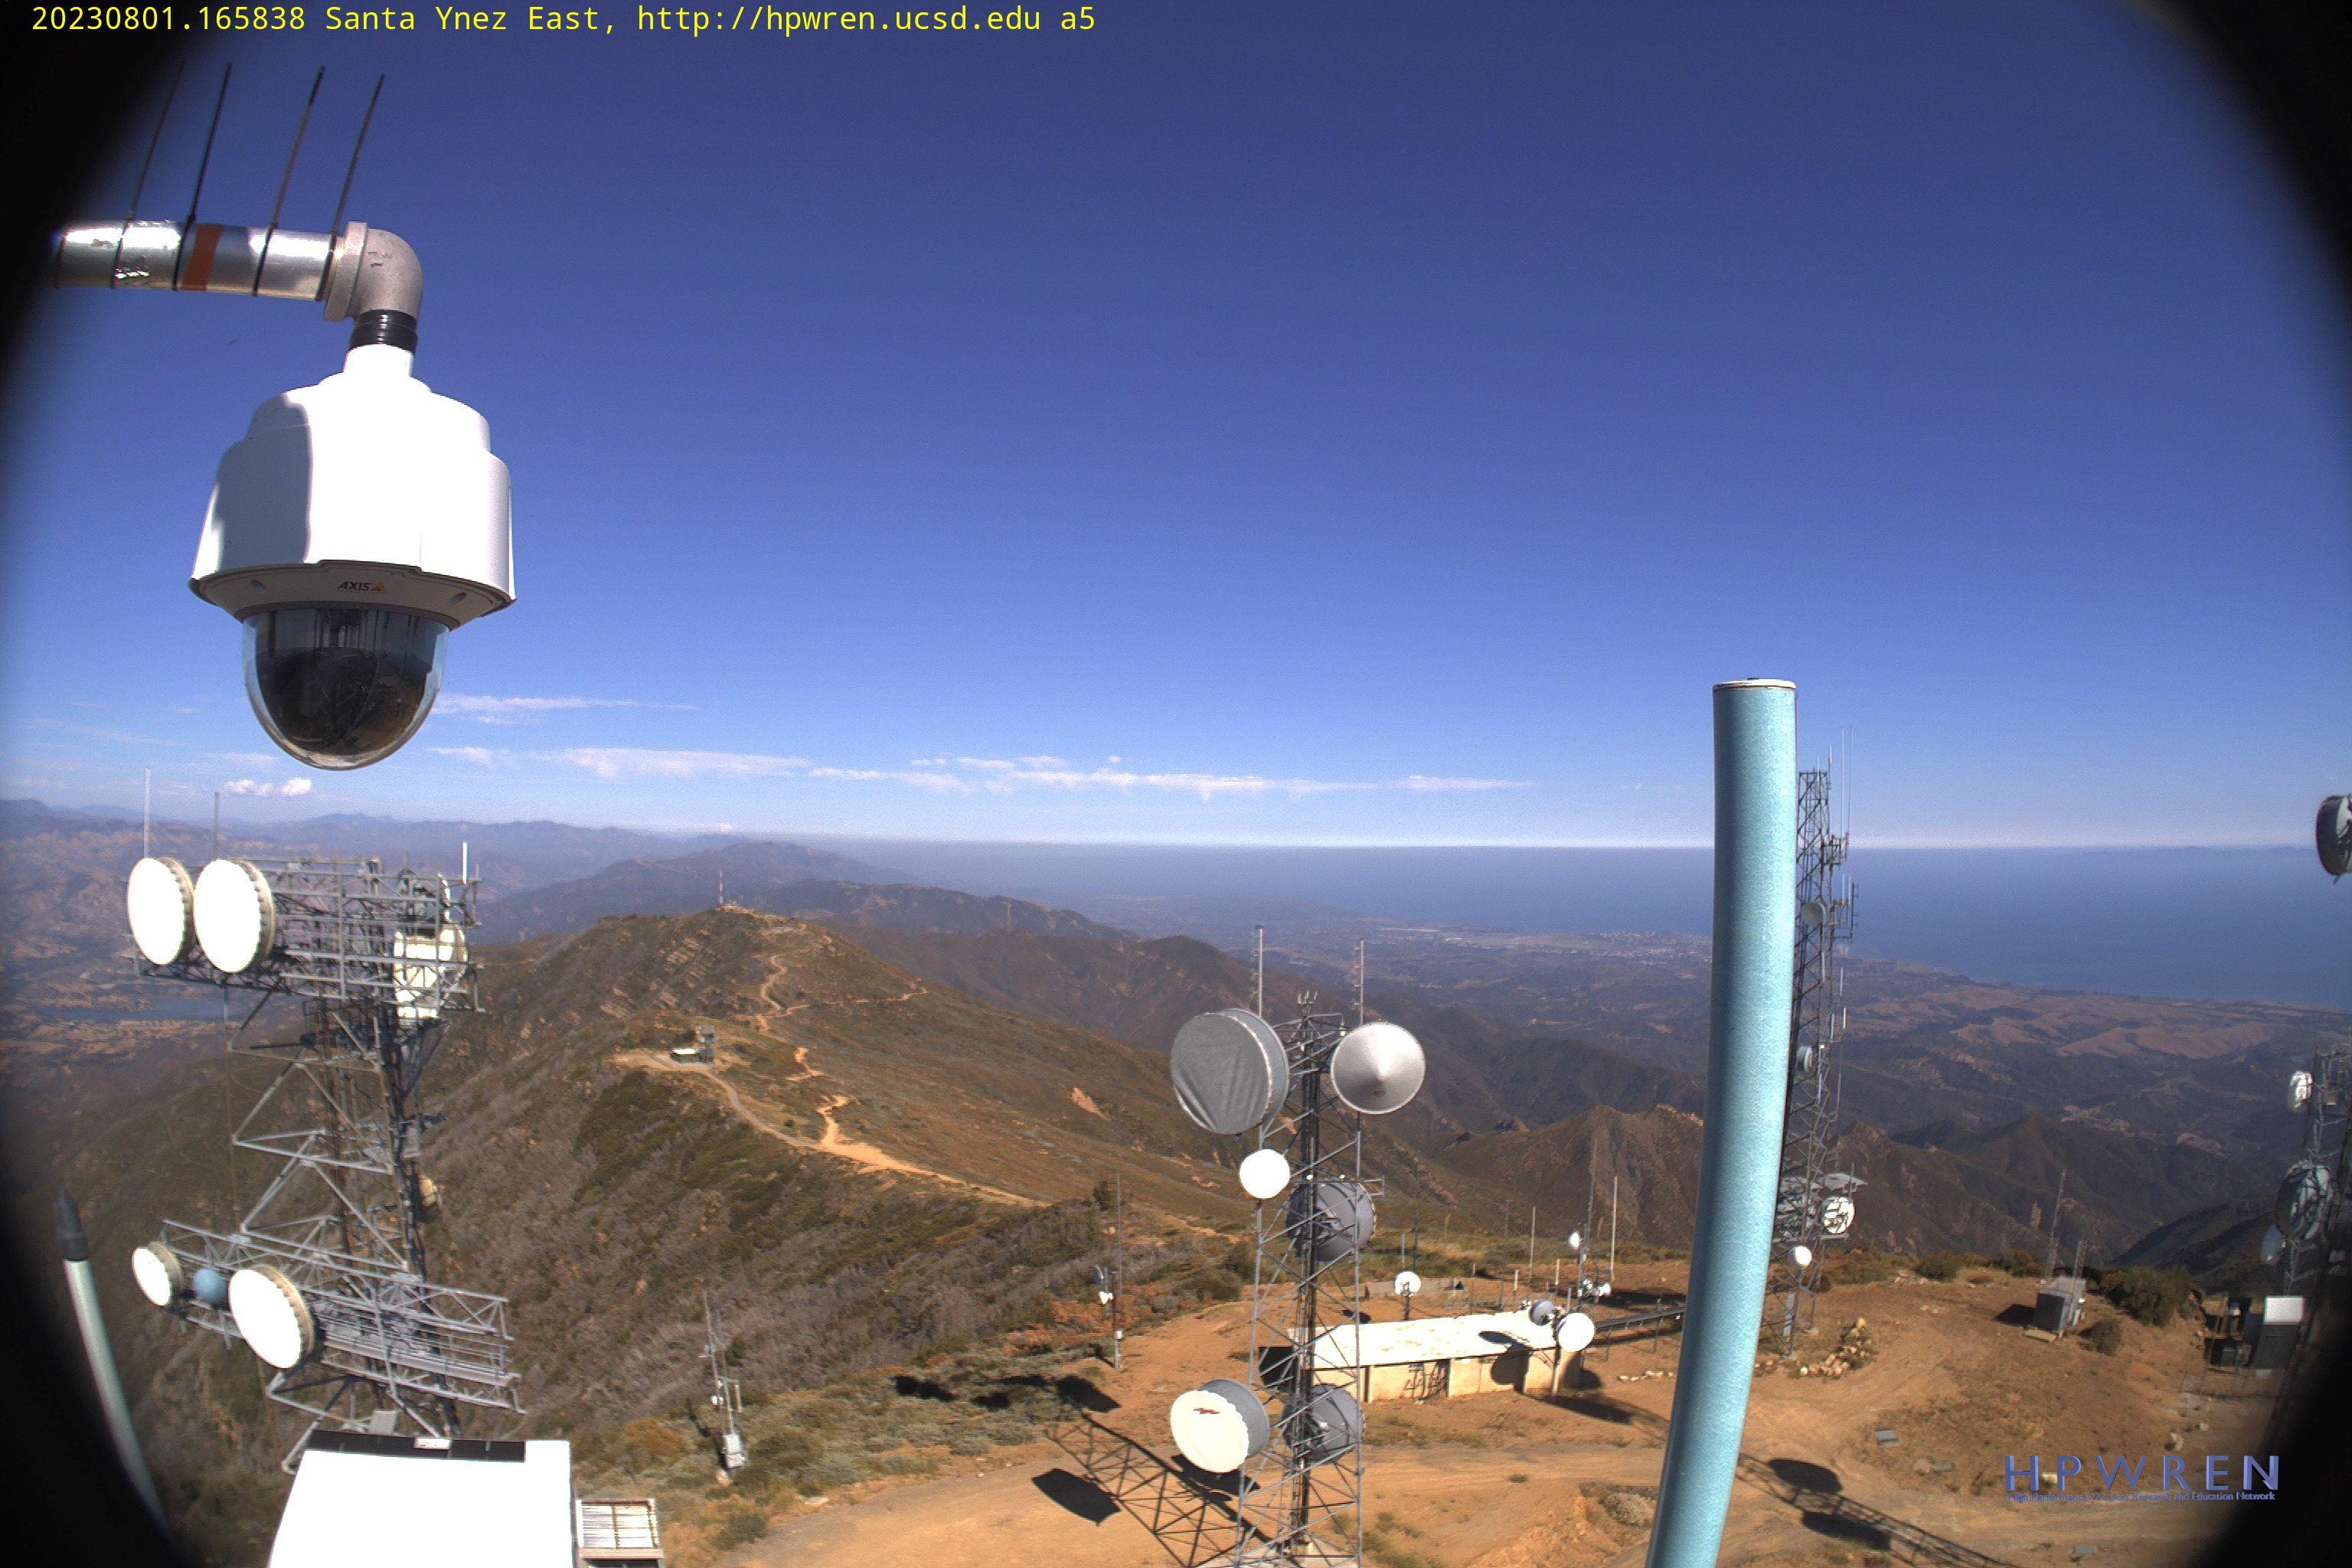 East Santa Ynez Peak